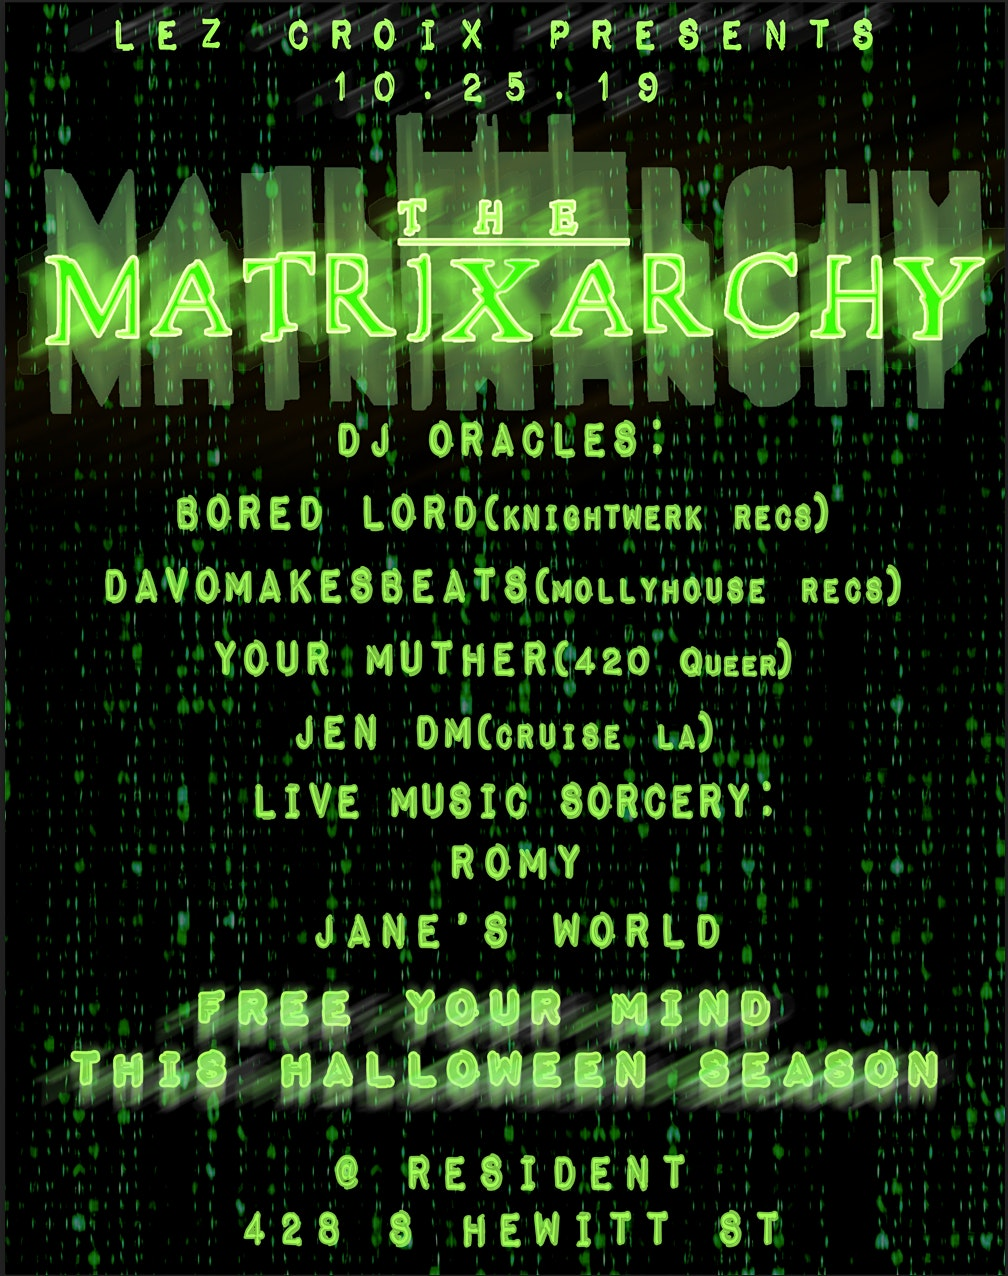 LEZ CROIX presents: the Matrixarchy Halloween Vortex